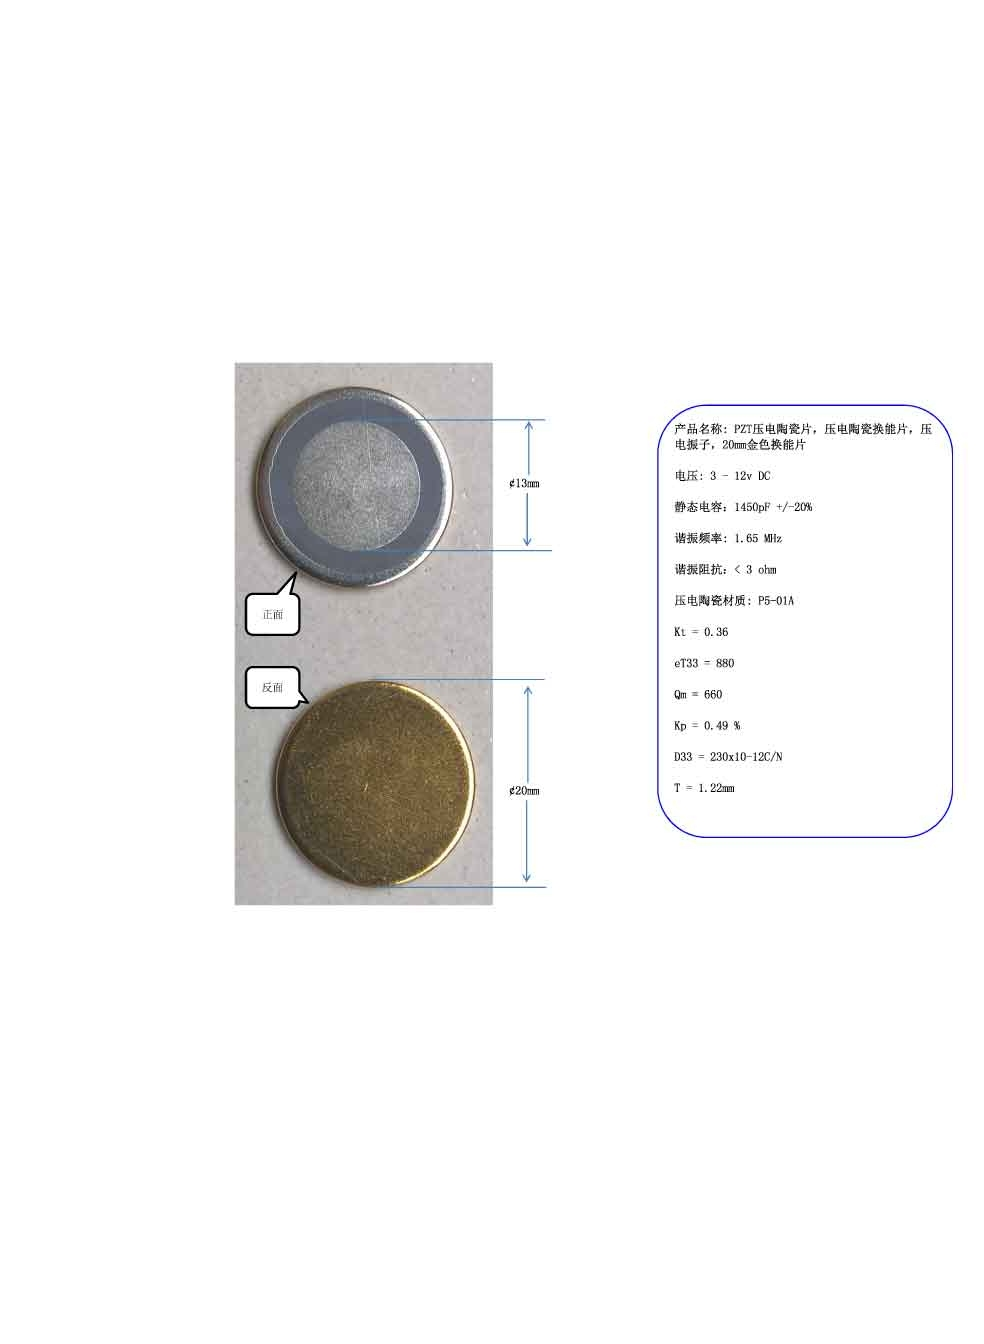 PZT piezoelectric ceramic chip, piezoelectric ceramic transducer, piezoelectric oscillator, 20mm gold film pzt piezoelectric ceramic atomizer medical piezoelectric ceramic piece